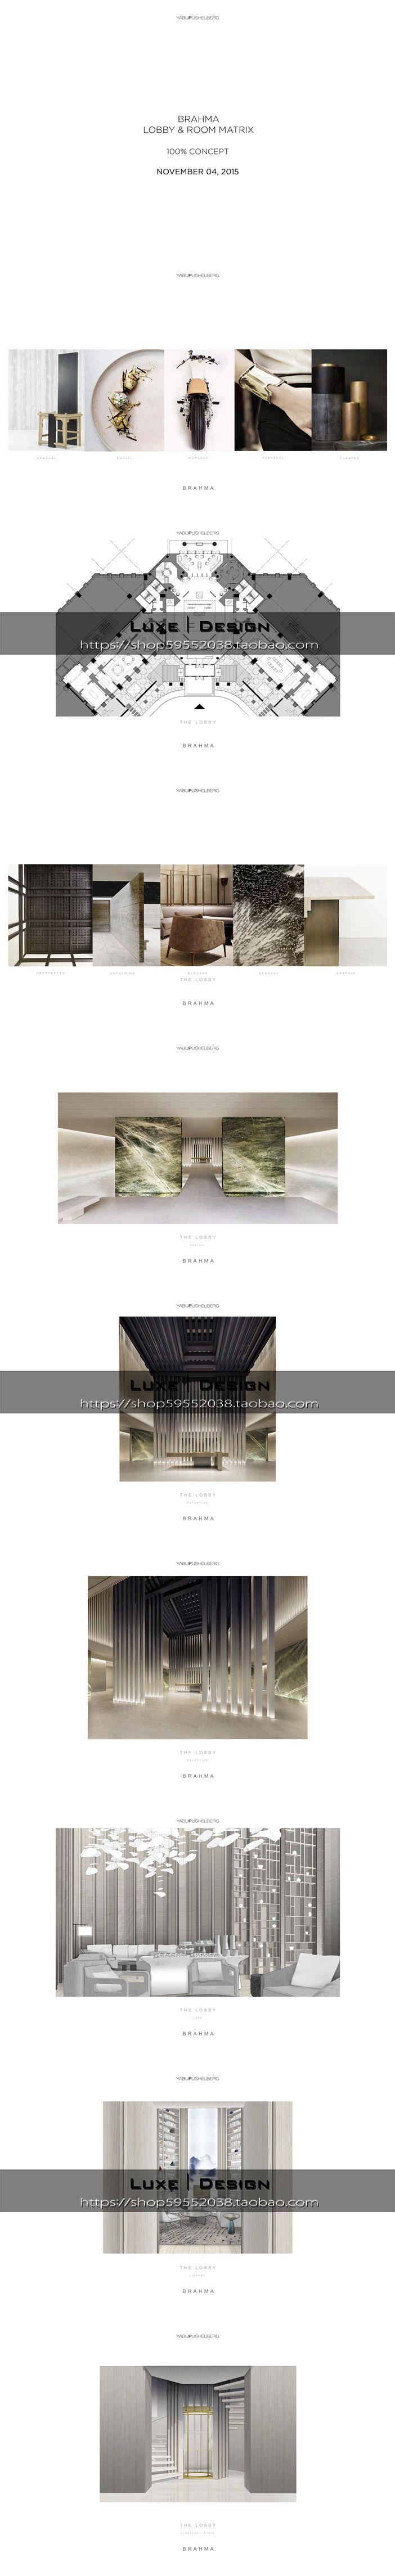 YABU PUSHELBERG北京梵悦样板房2015-10-30_BRAHMA 概念方案册子-淘宝网